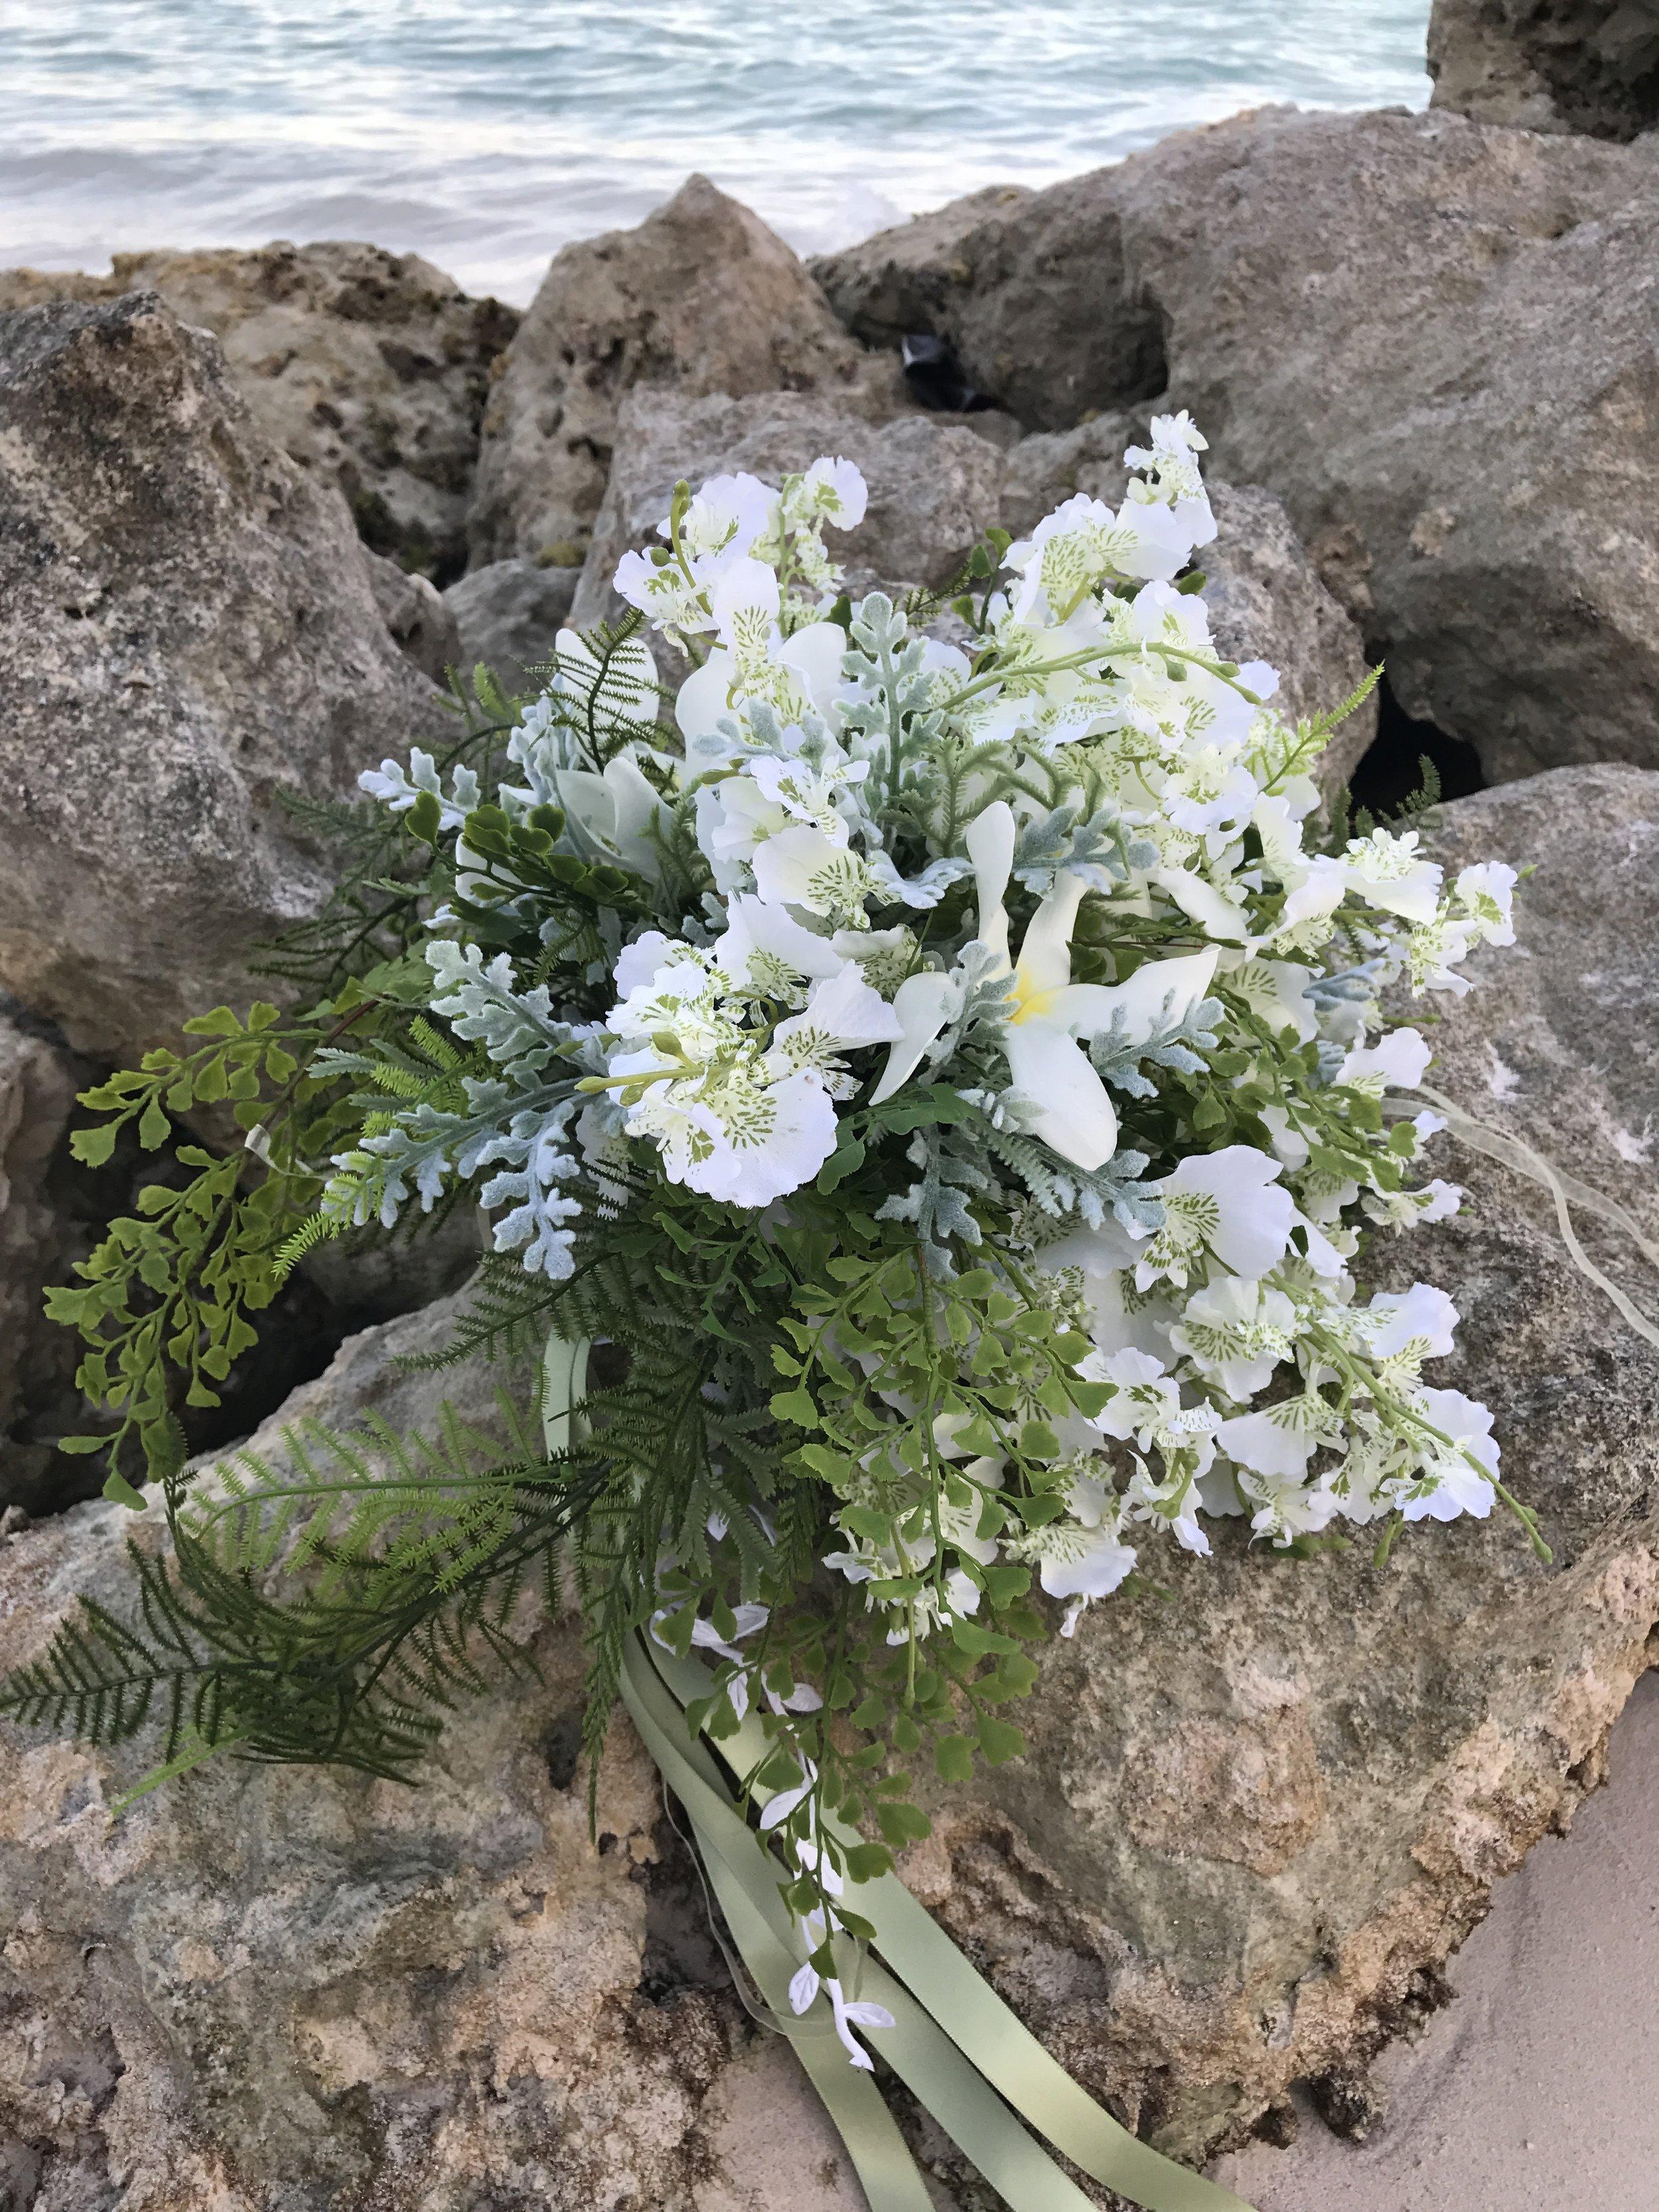 Atelier Ashley Flowers + Destination Wedding + Dominican Republic + DC Wedding Florist + Sarasota Wedding Florist + Tahoe Wedding Florist + Art + Flowers + https://www.atelierashleyflowers.com